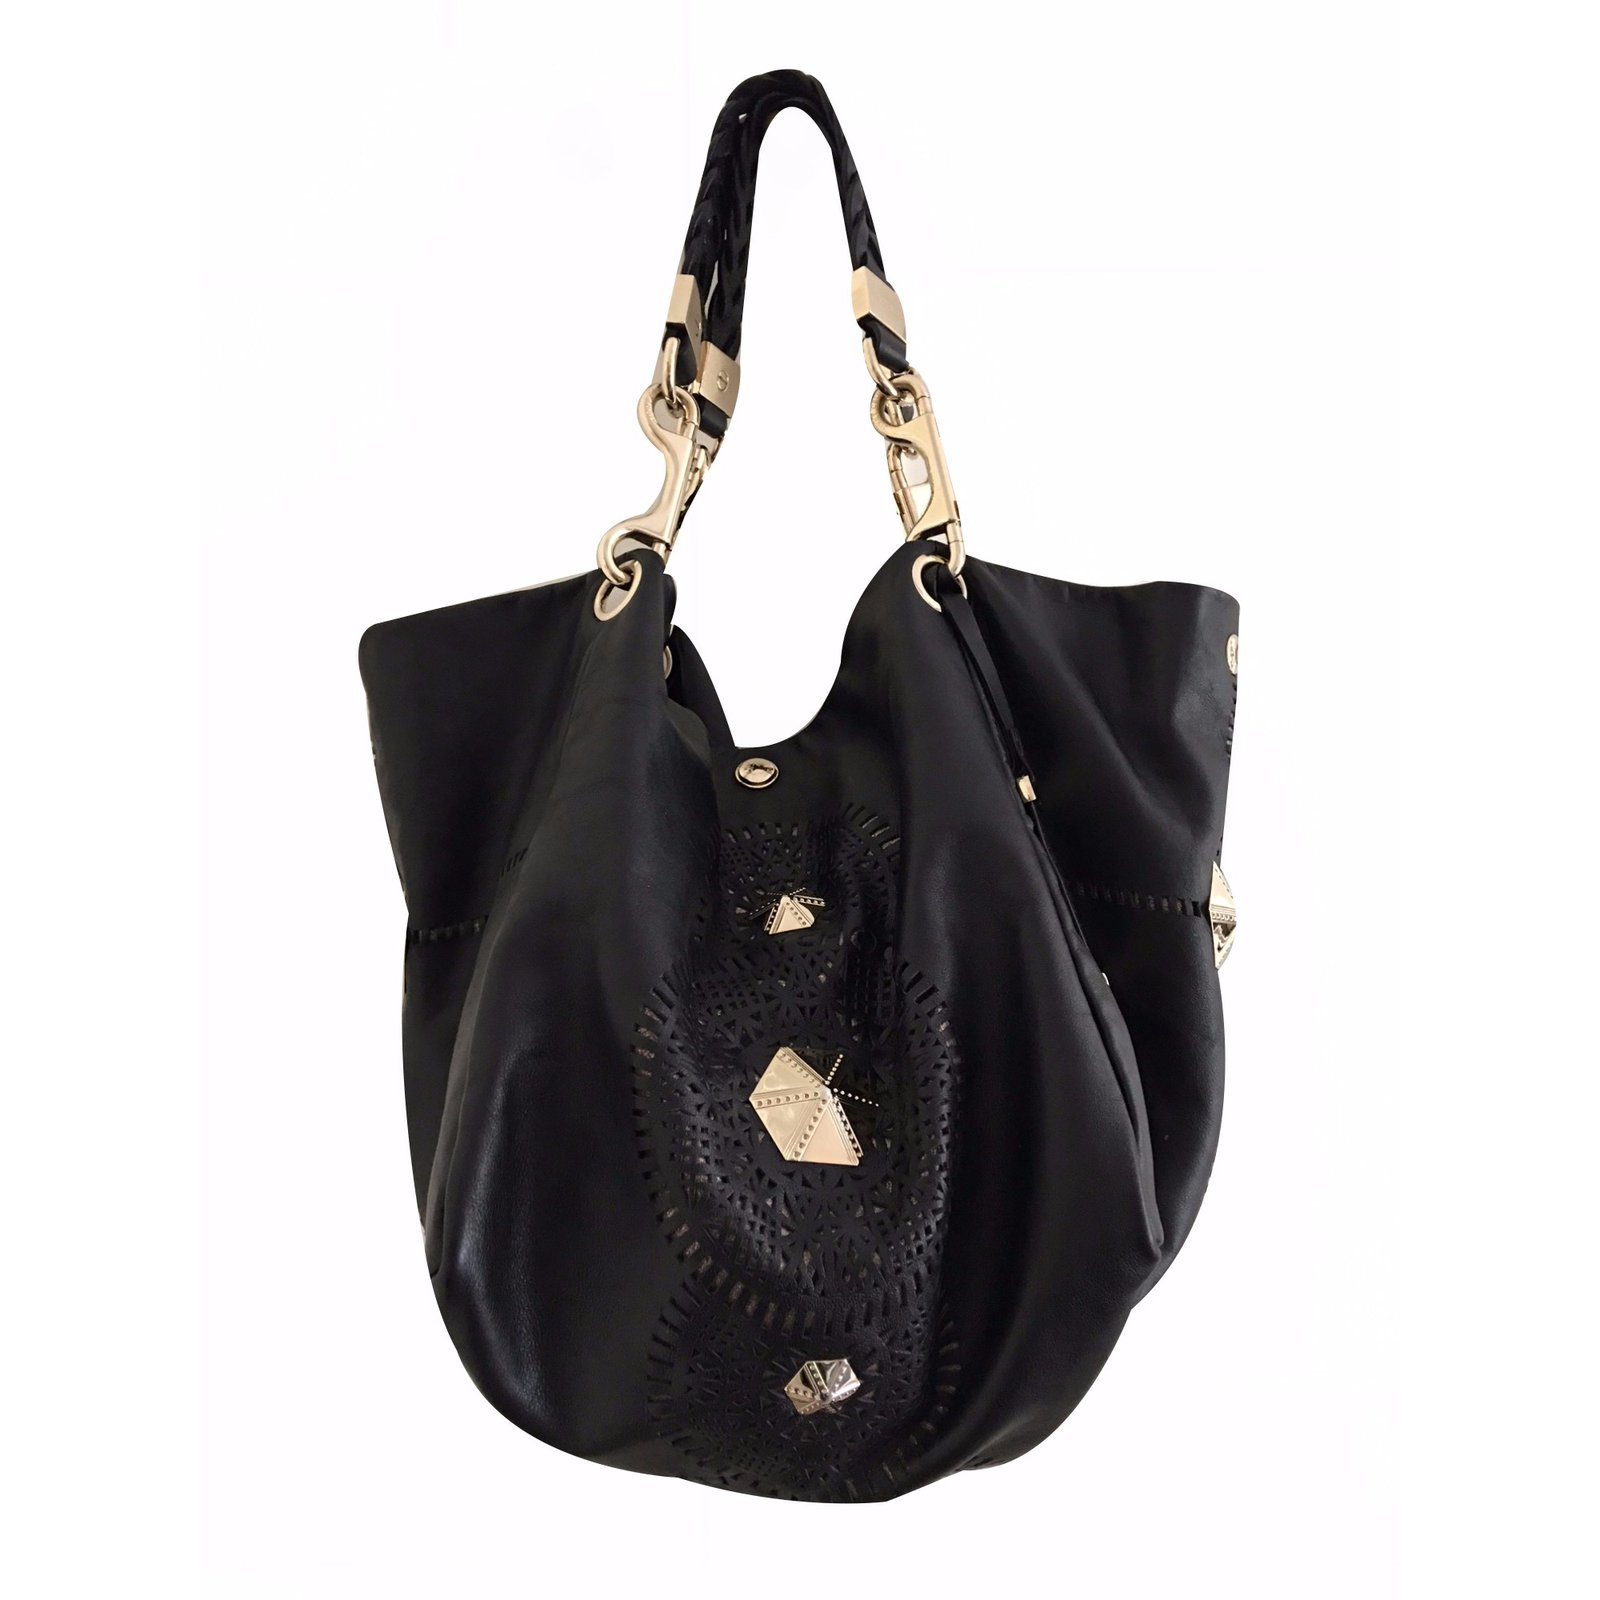 6664c7d5b7e Jimmy Choo Lohla m perforated pyramid bag Handbags Leather Black ref.17952